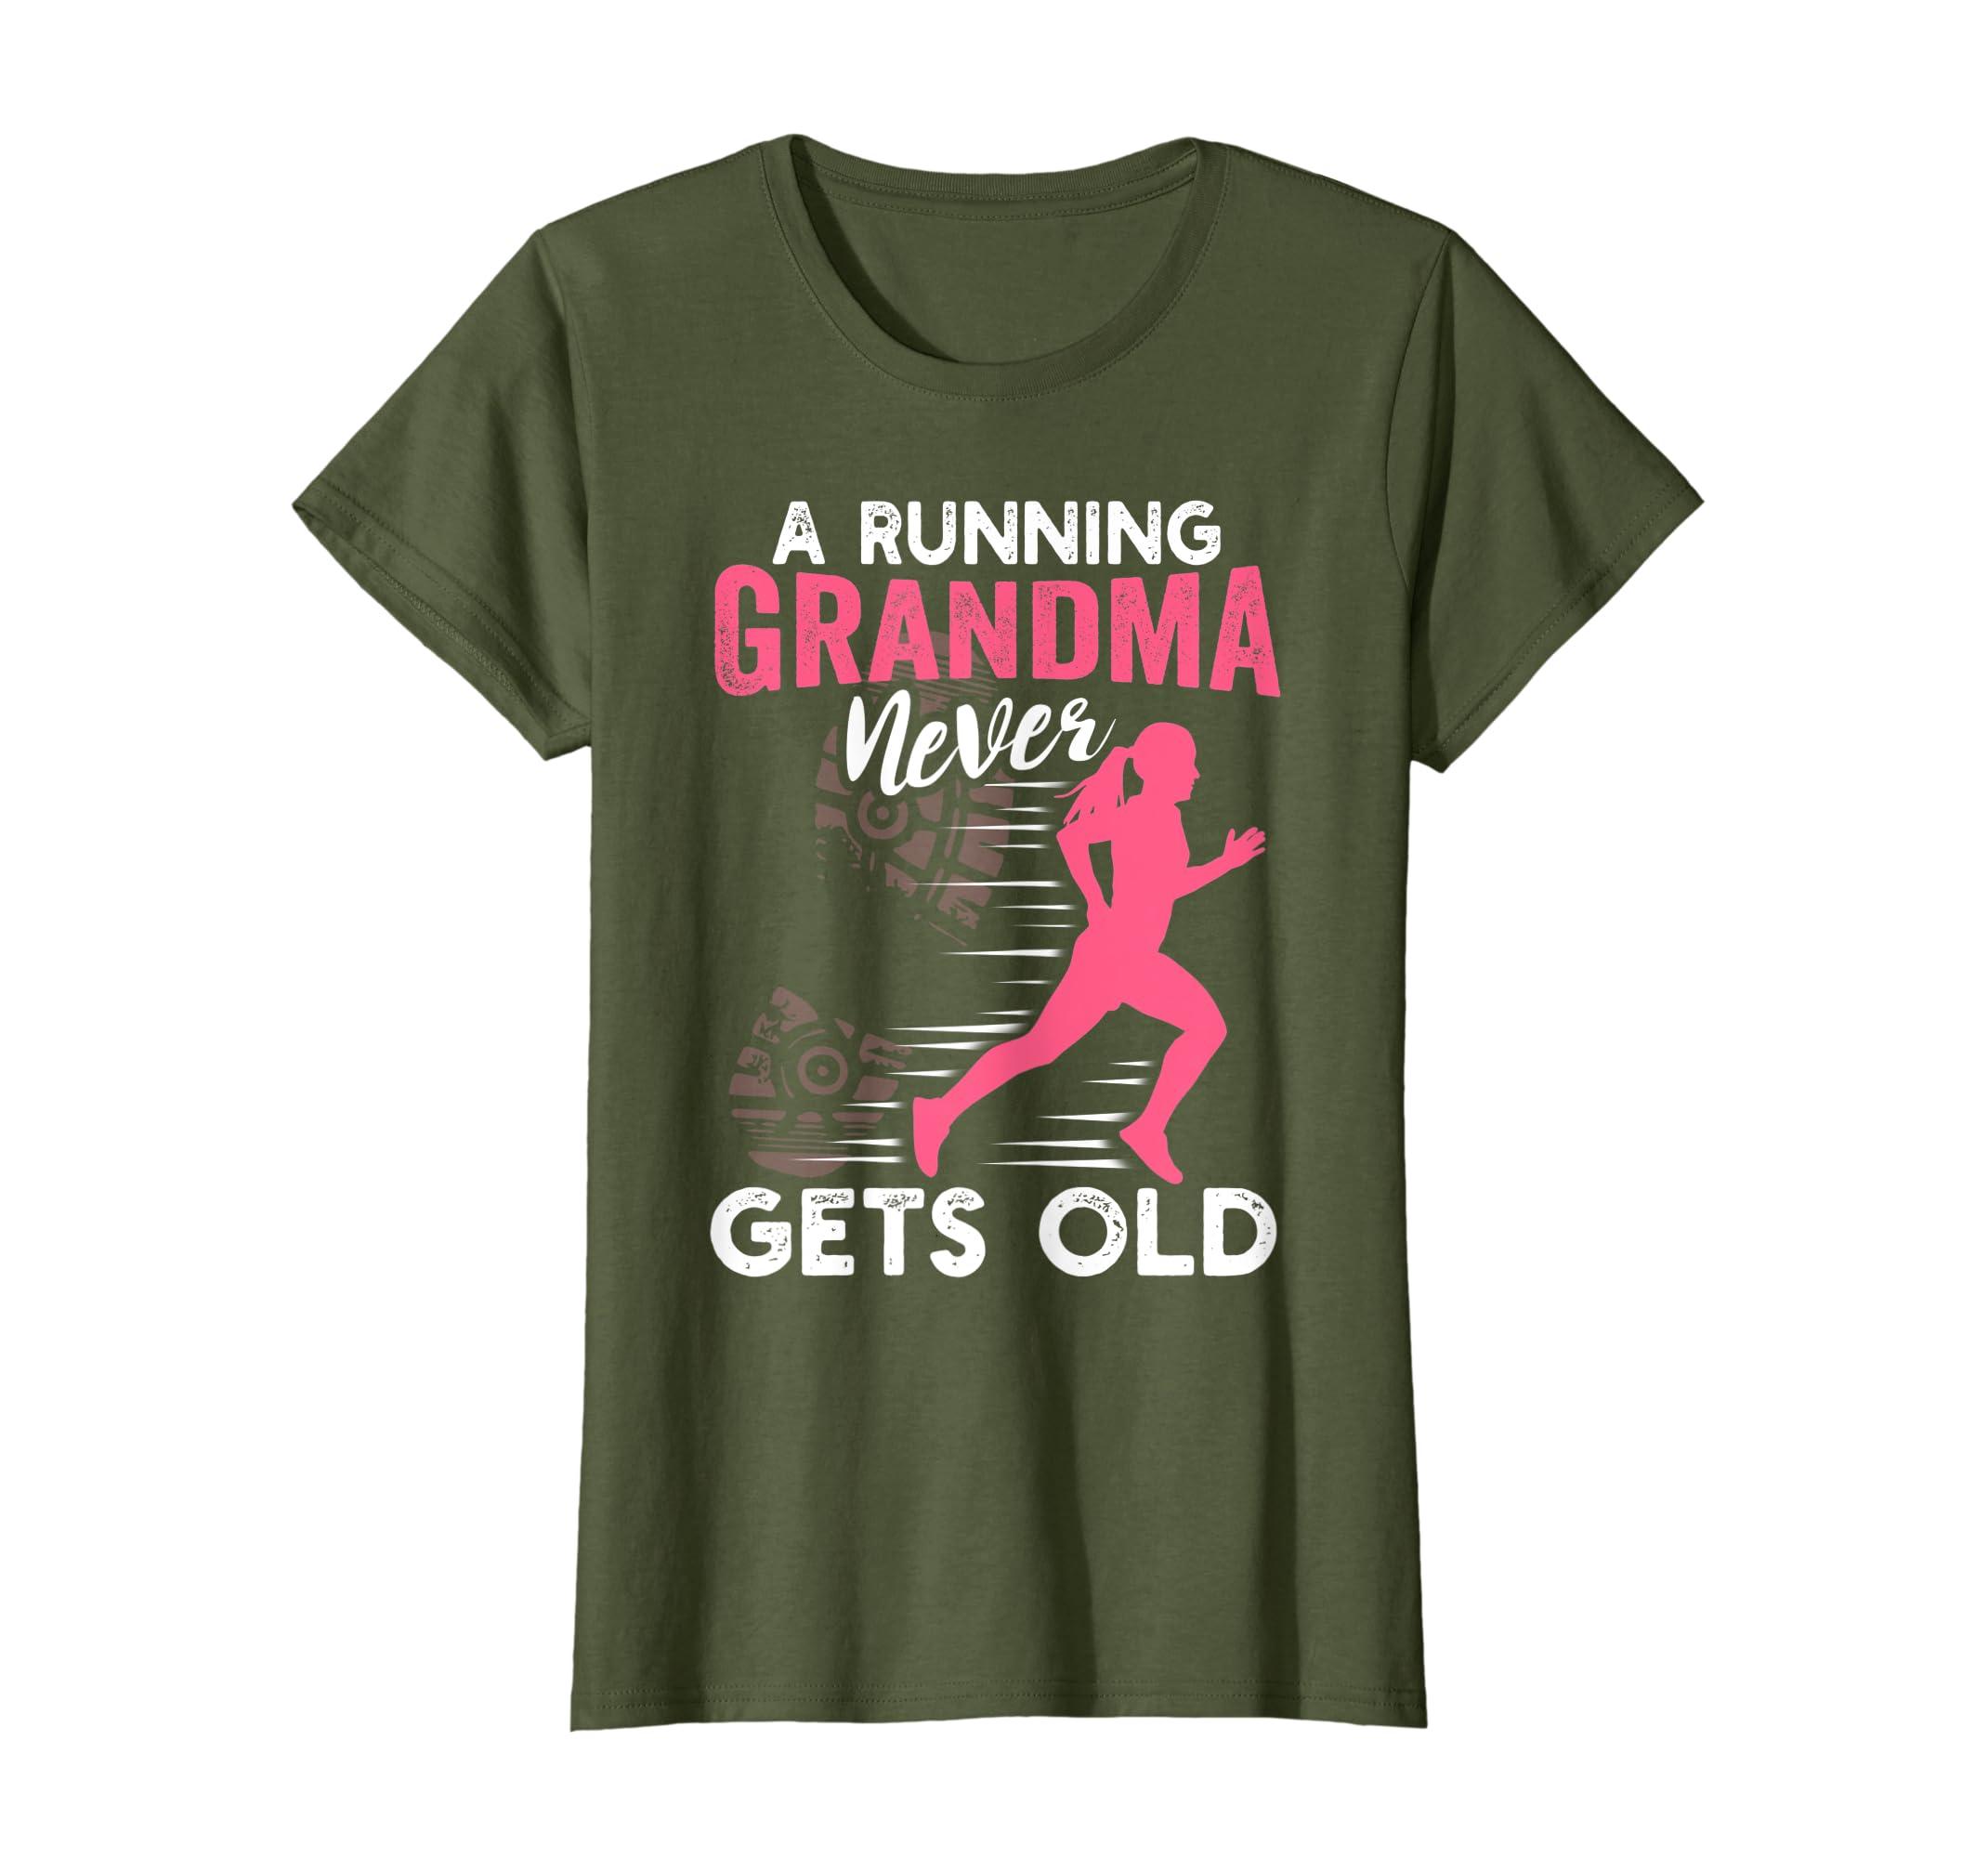 451f1cf4 Amazon.com: A Running Grandma Never Gets Old Running Runner T-Shirt:  Clothing